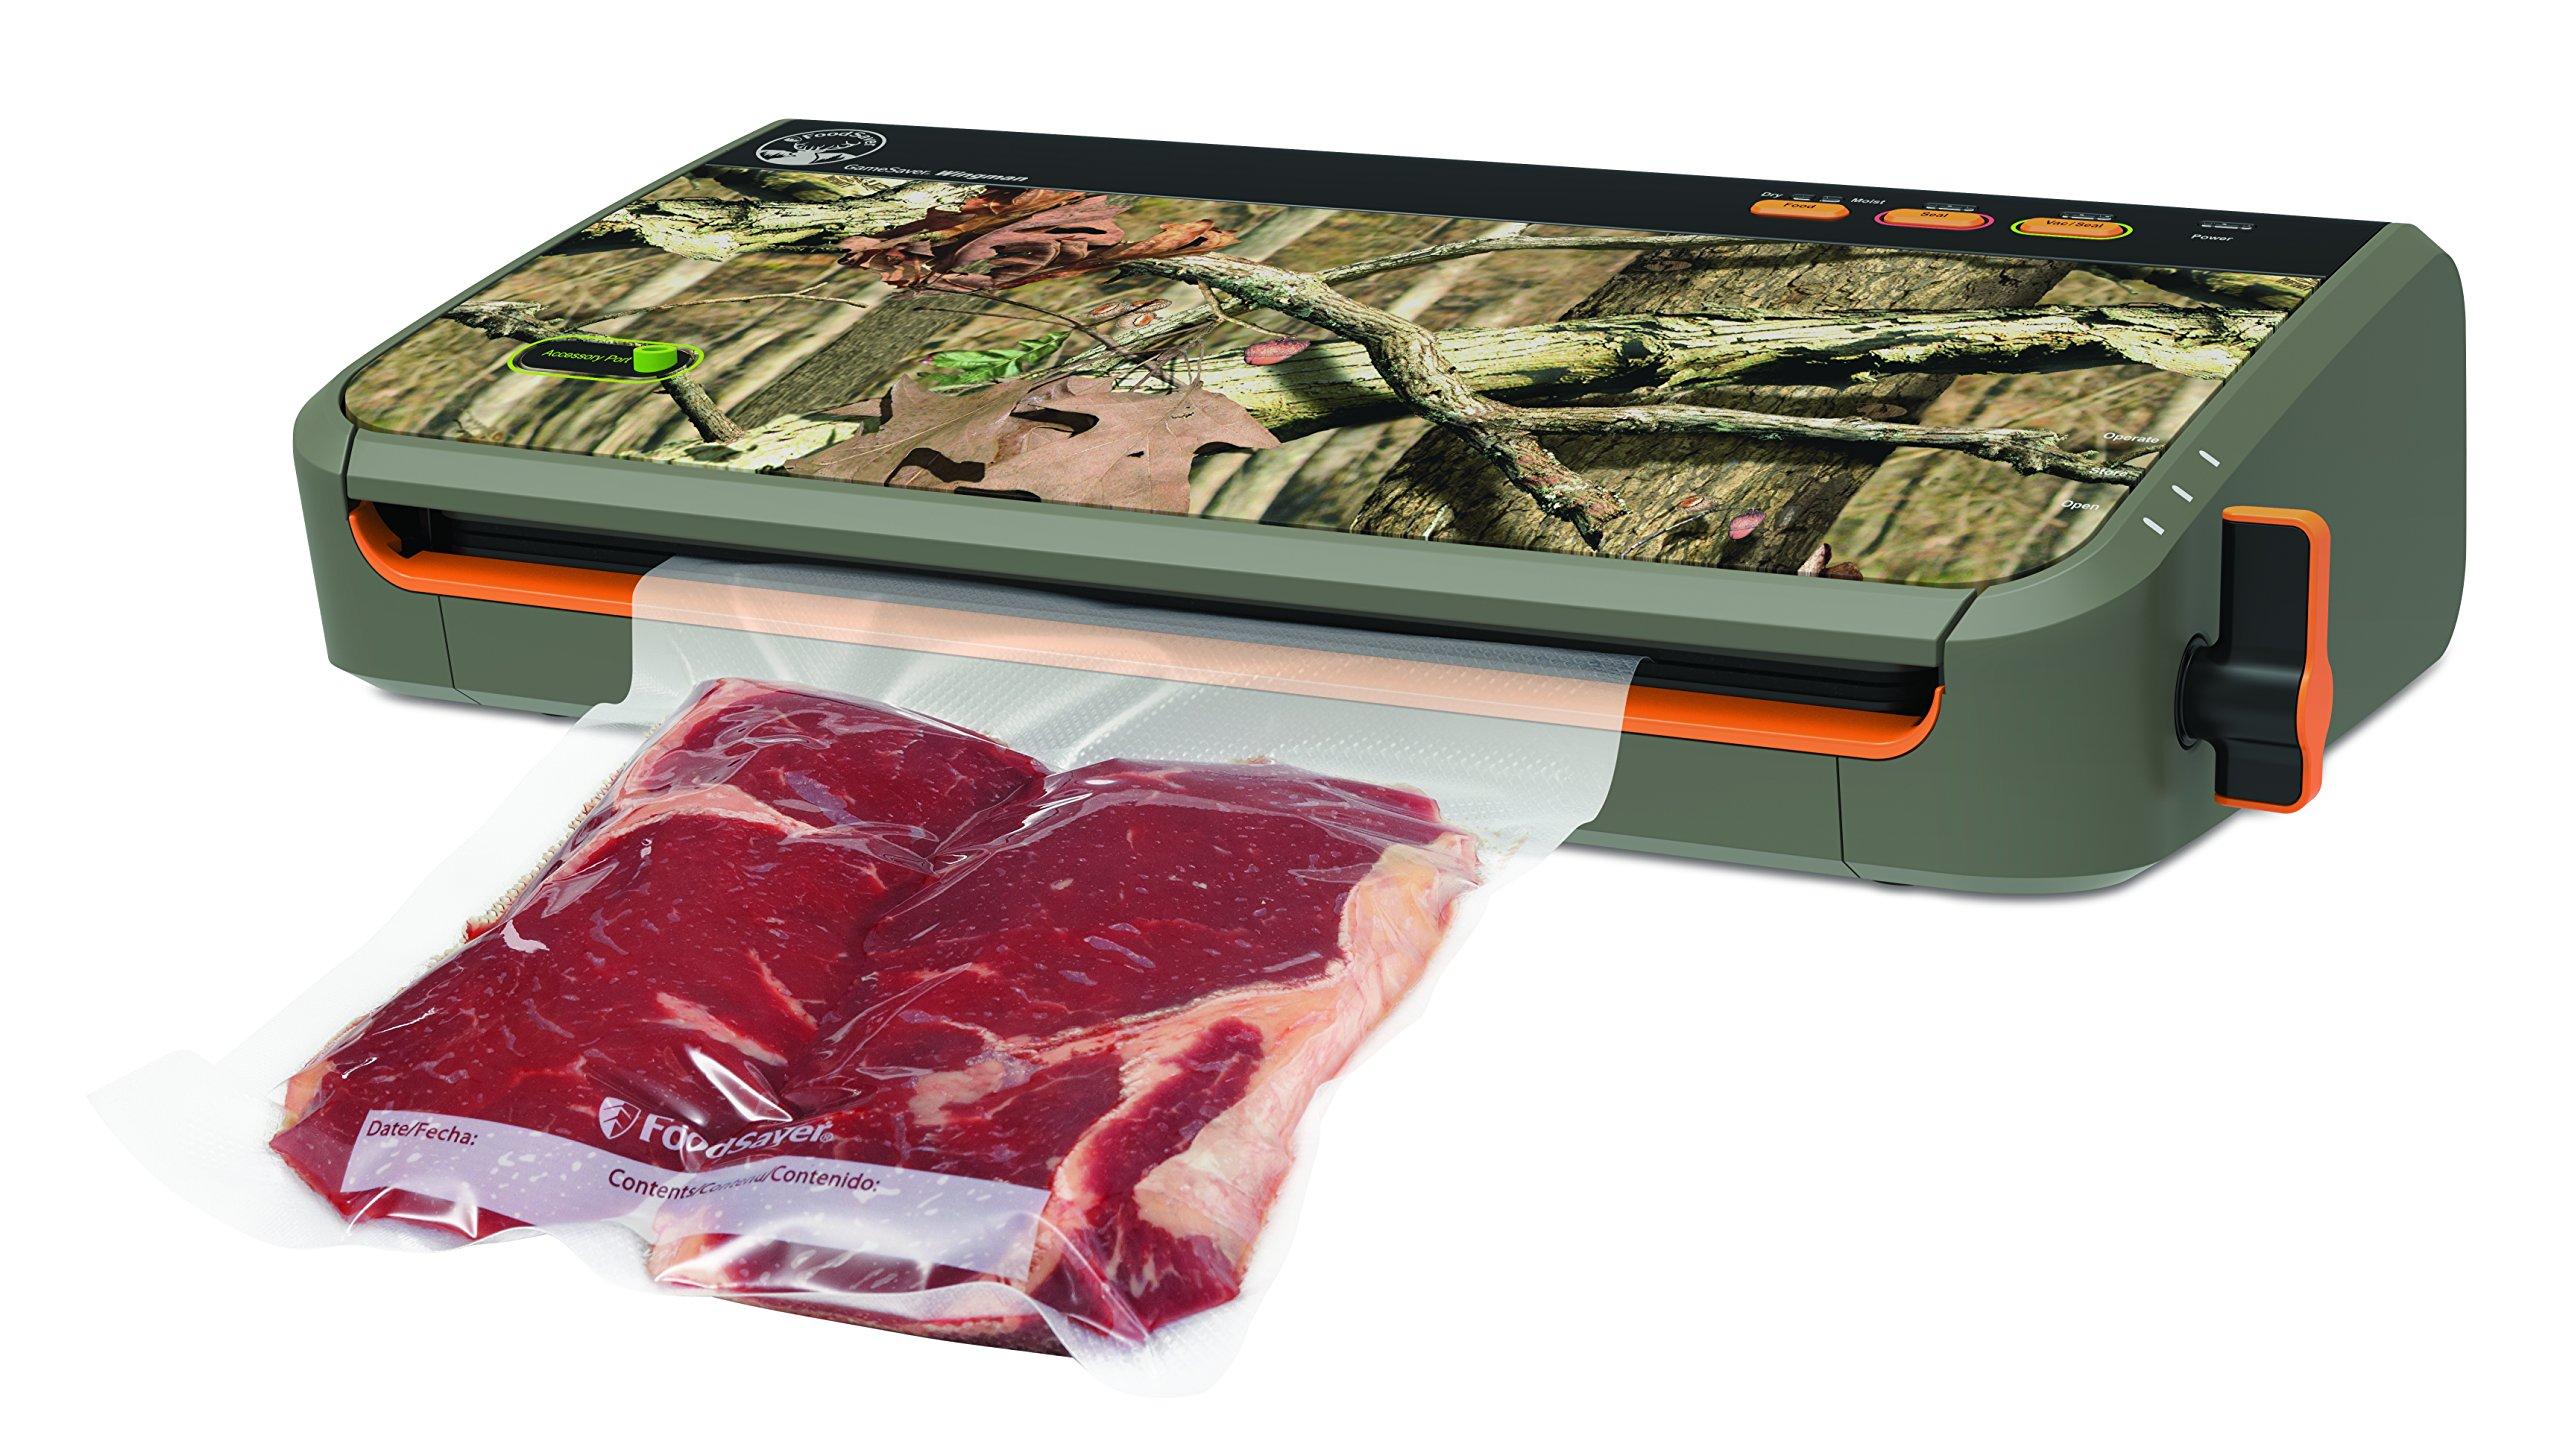 FoodSaver GameSaver Wingman Vacuum Sealing System, Designed for up to 60 Consecutive Seals, GM2150-000